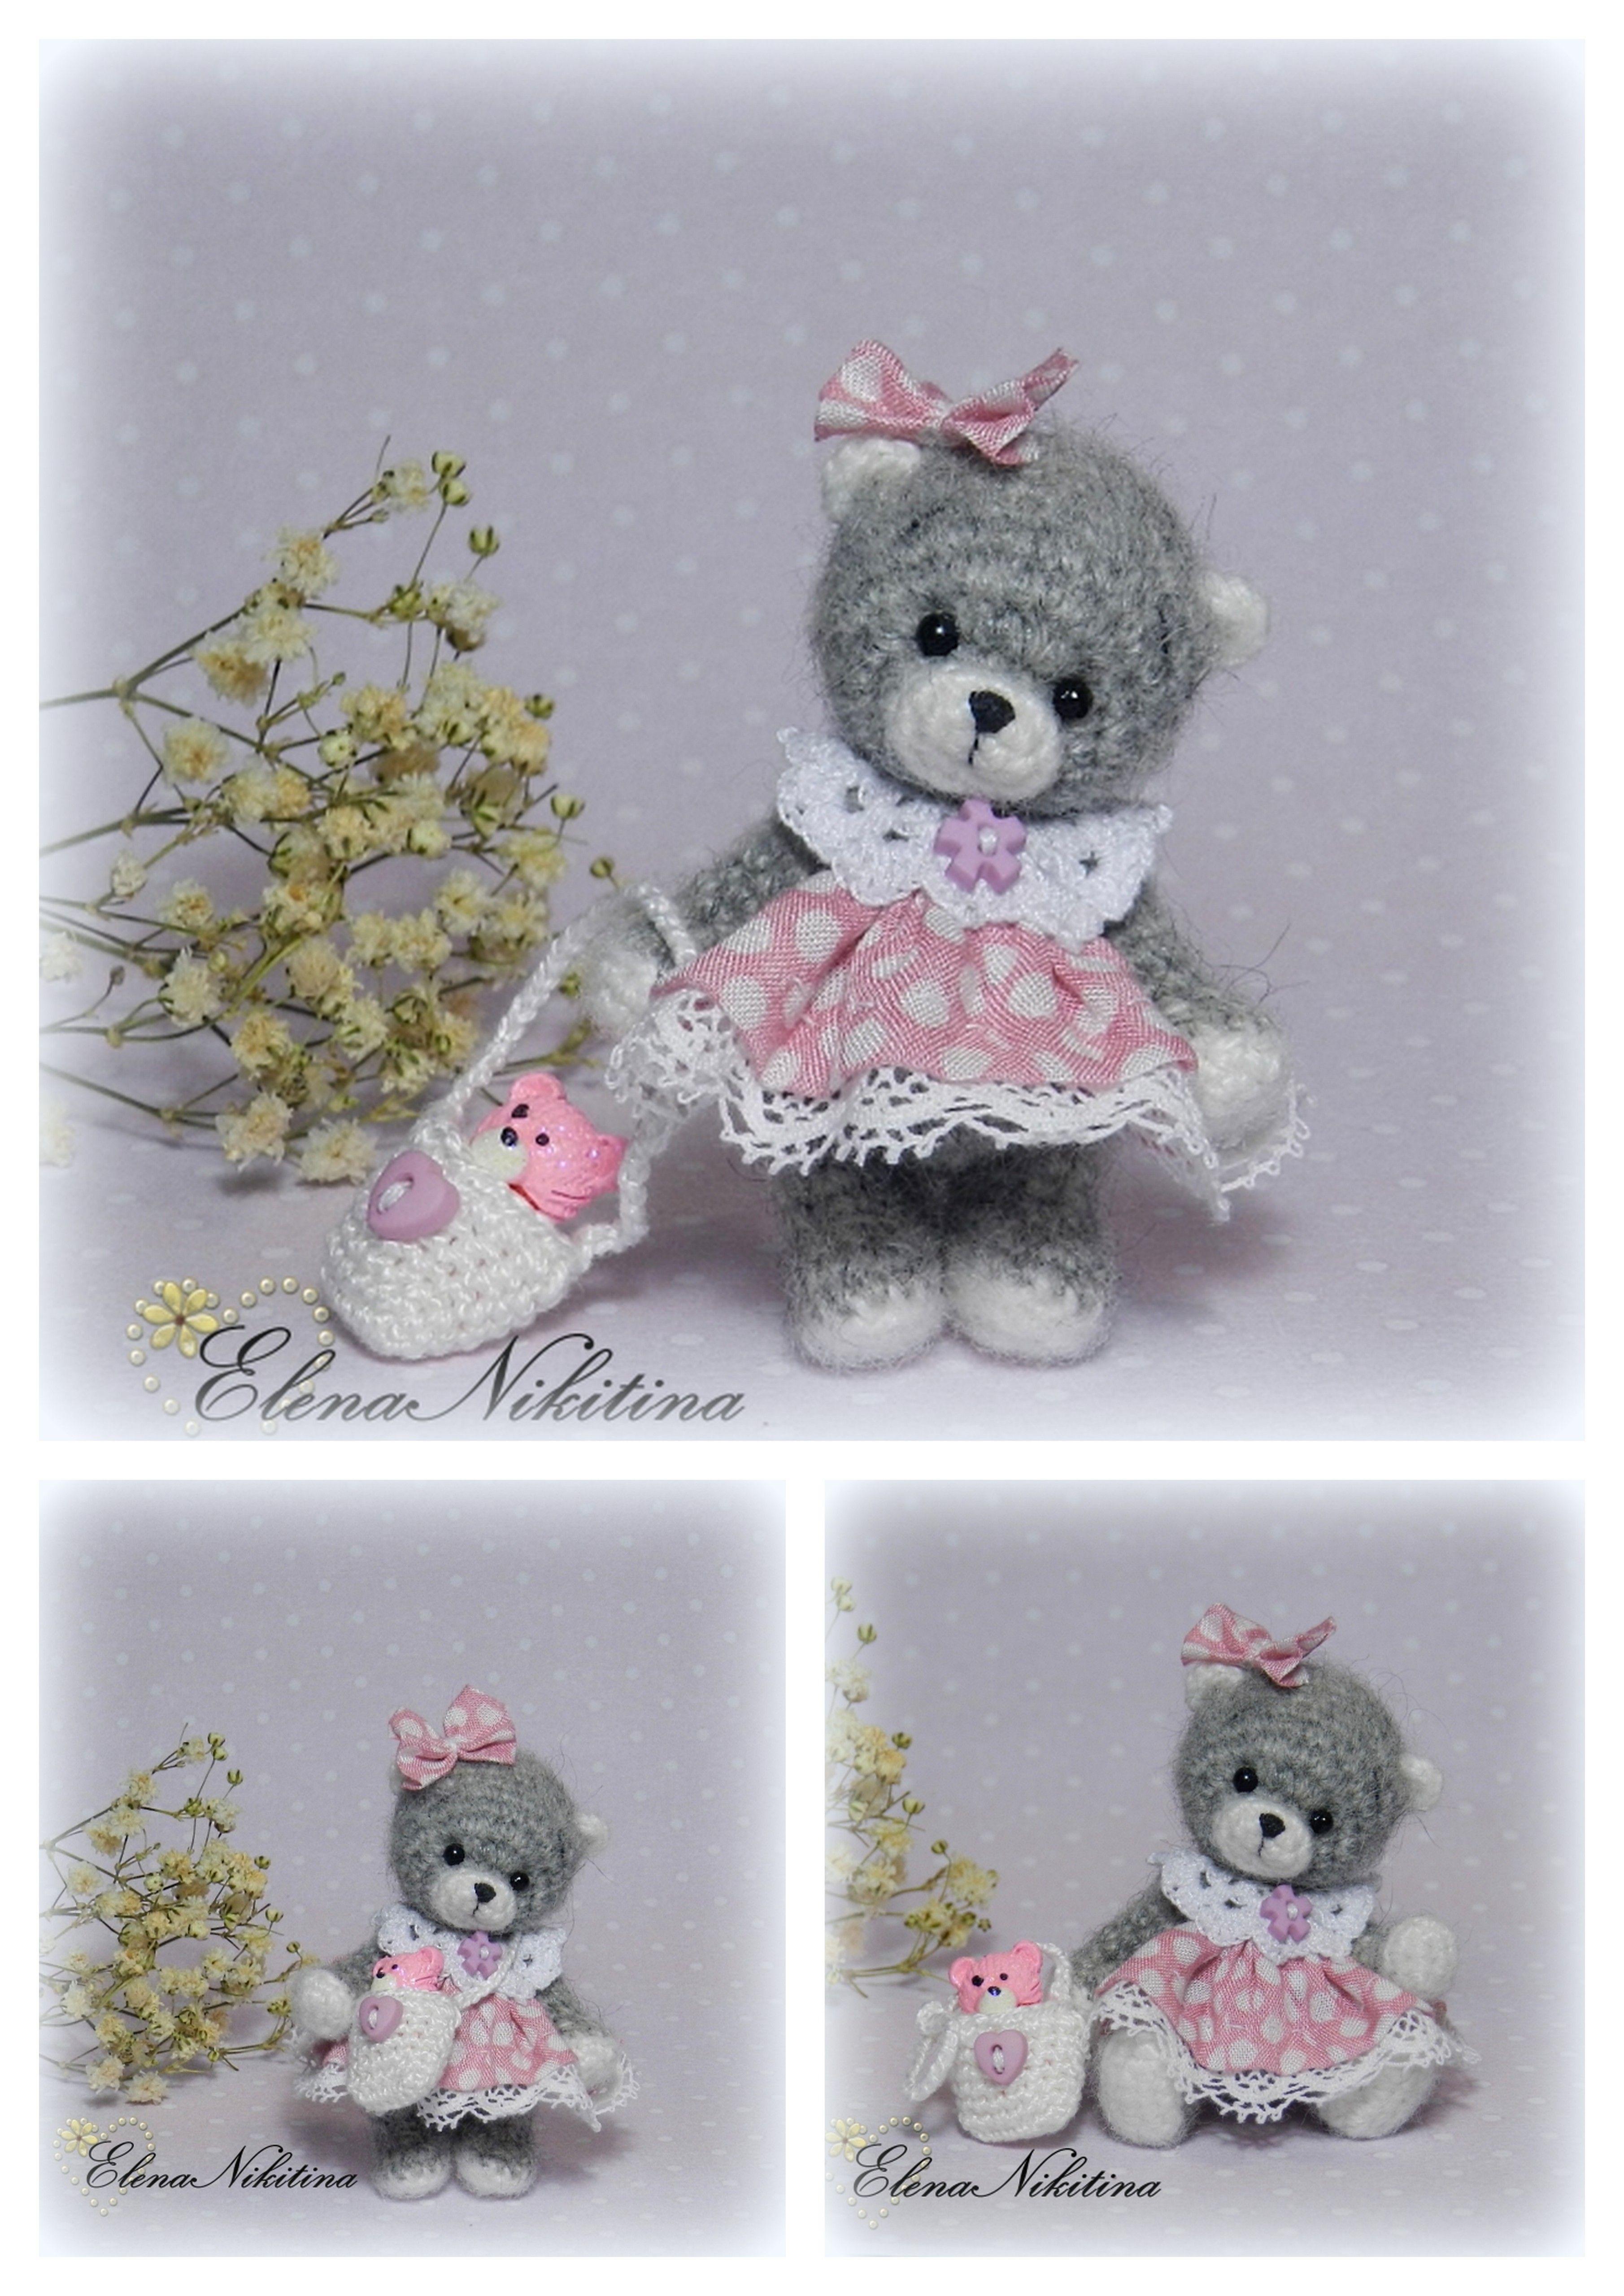 Teddy bear in a pink dress. Elena Nikitina.